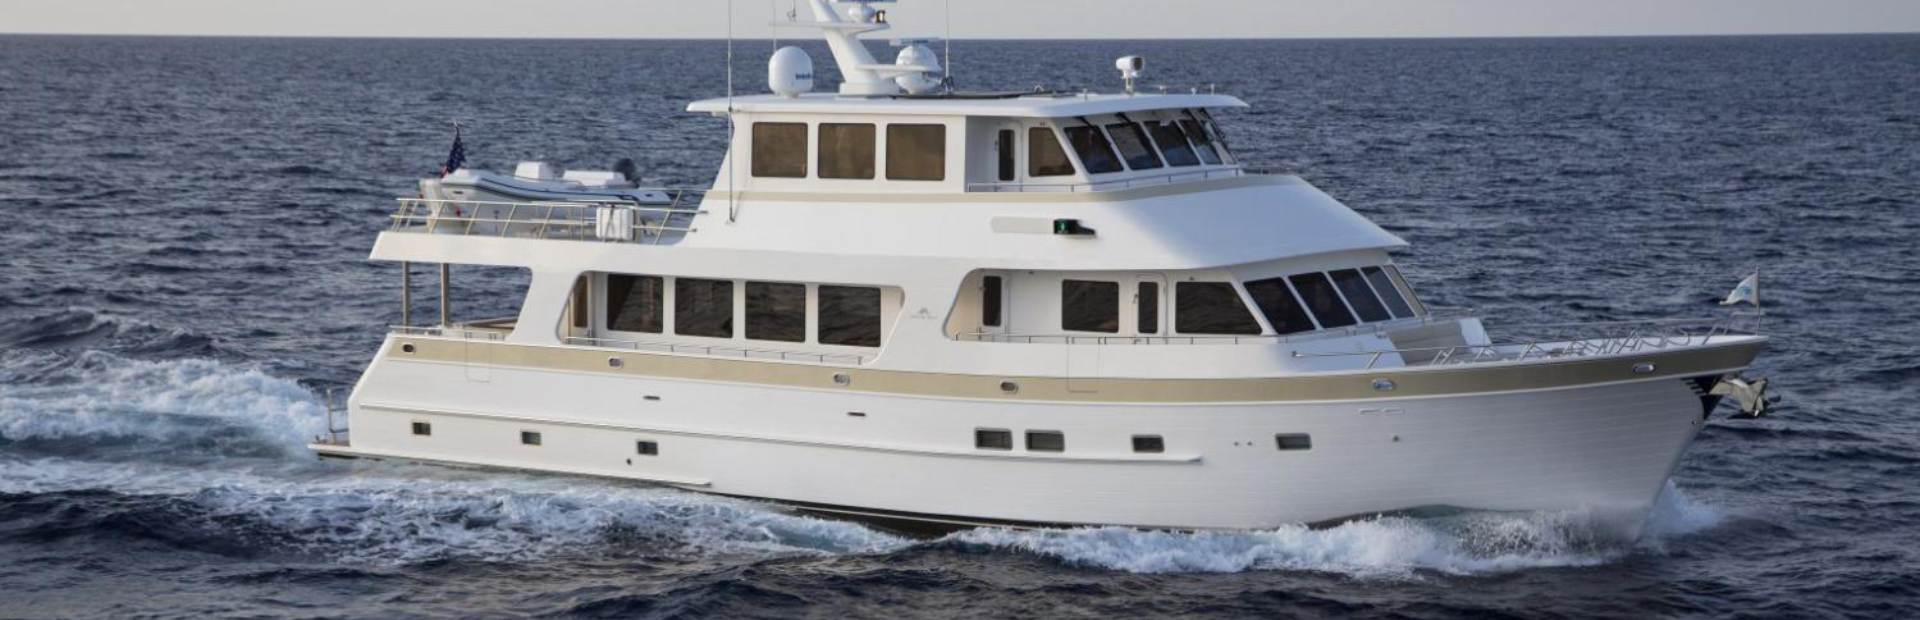 860 Deluxbridge Skylounge Motoryacht Yacht Charter